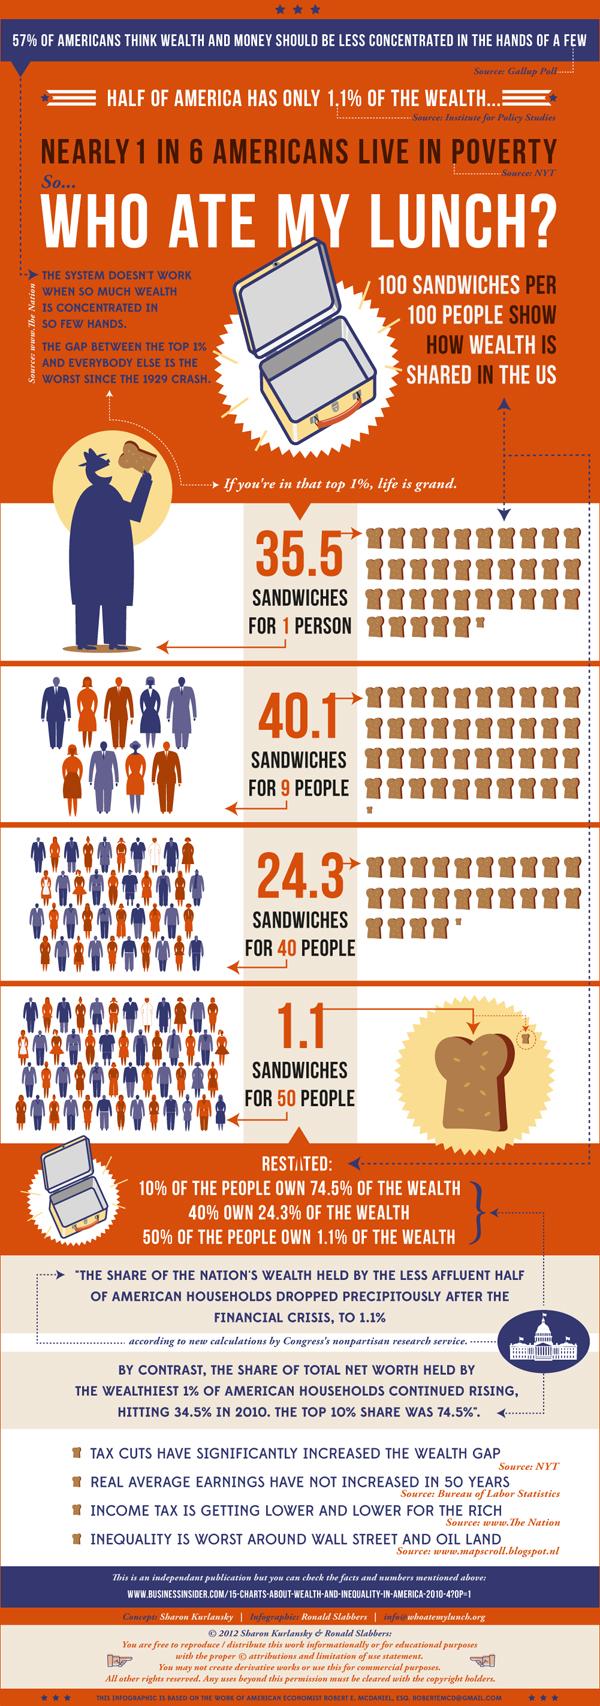 WAML-infographic-600